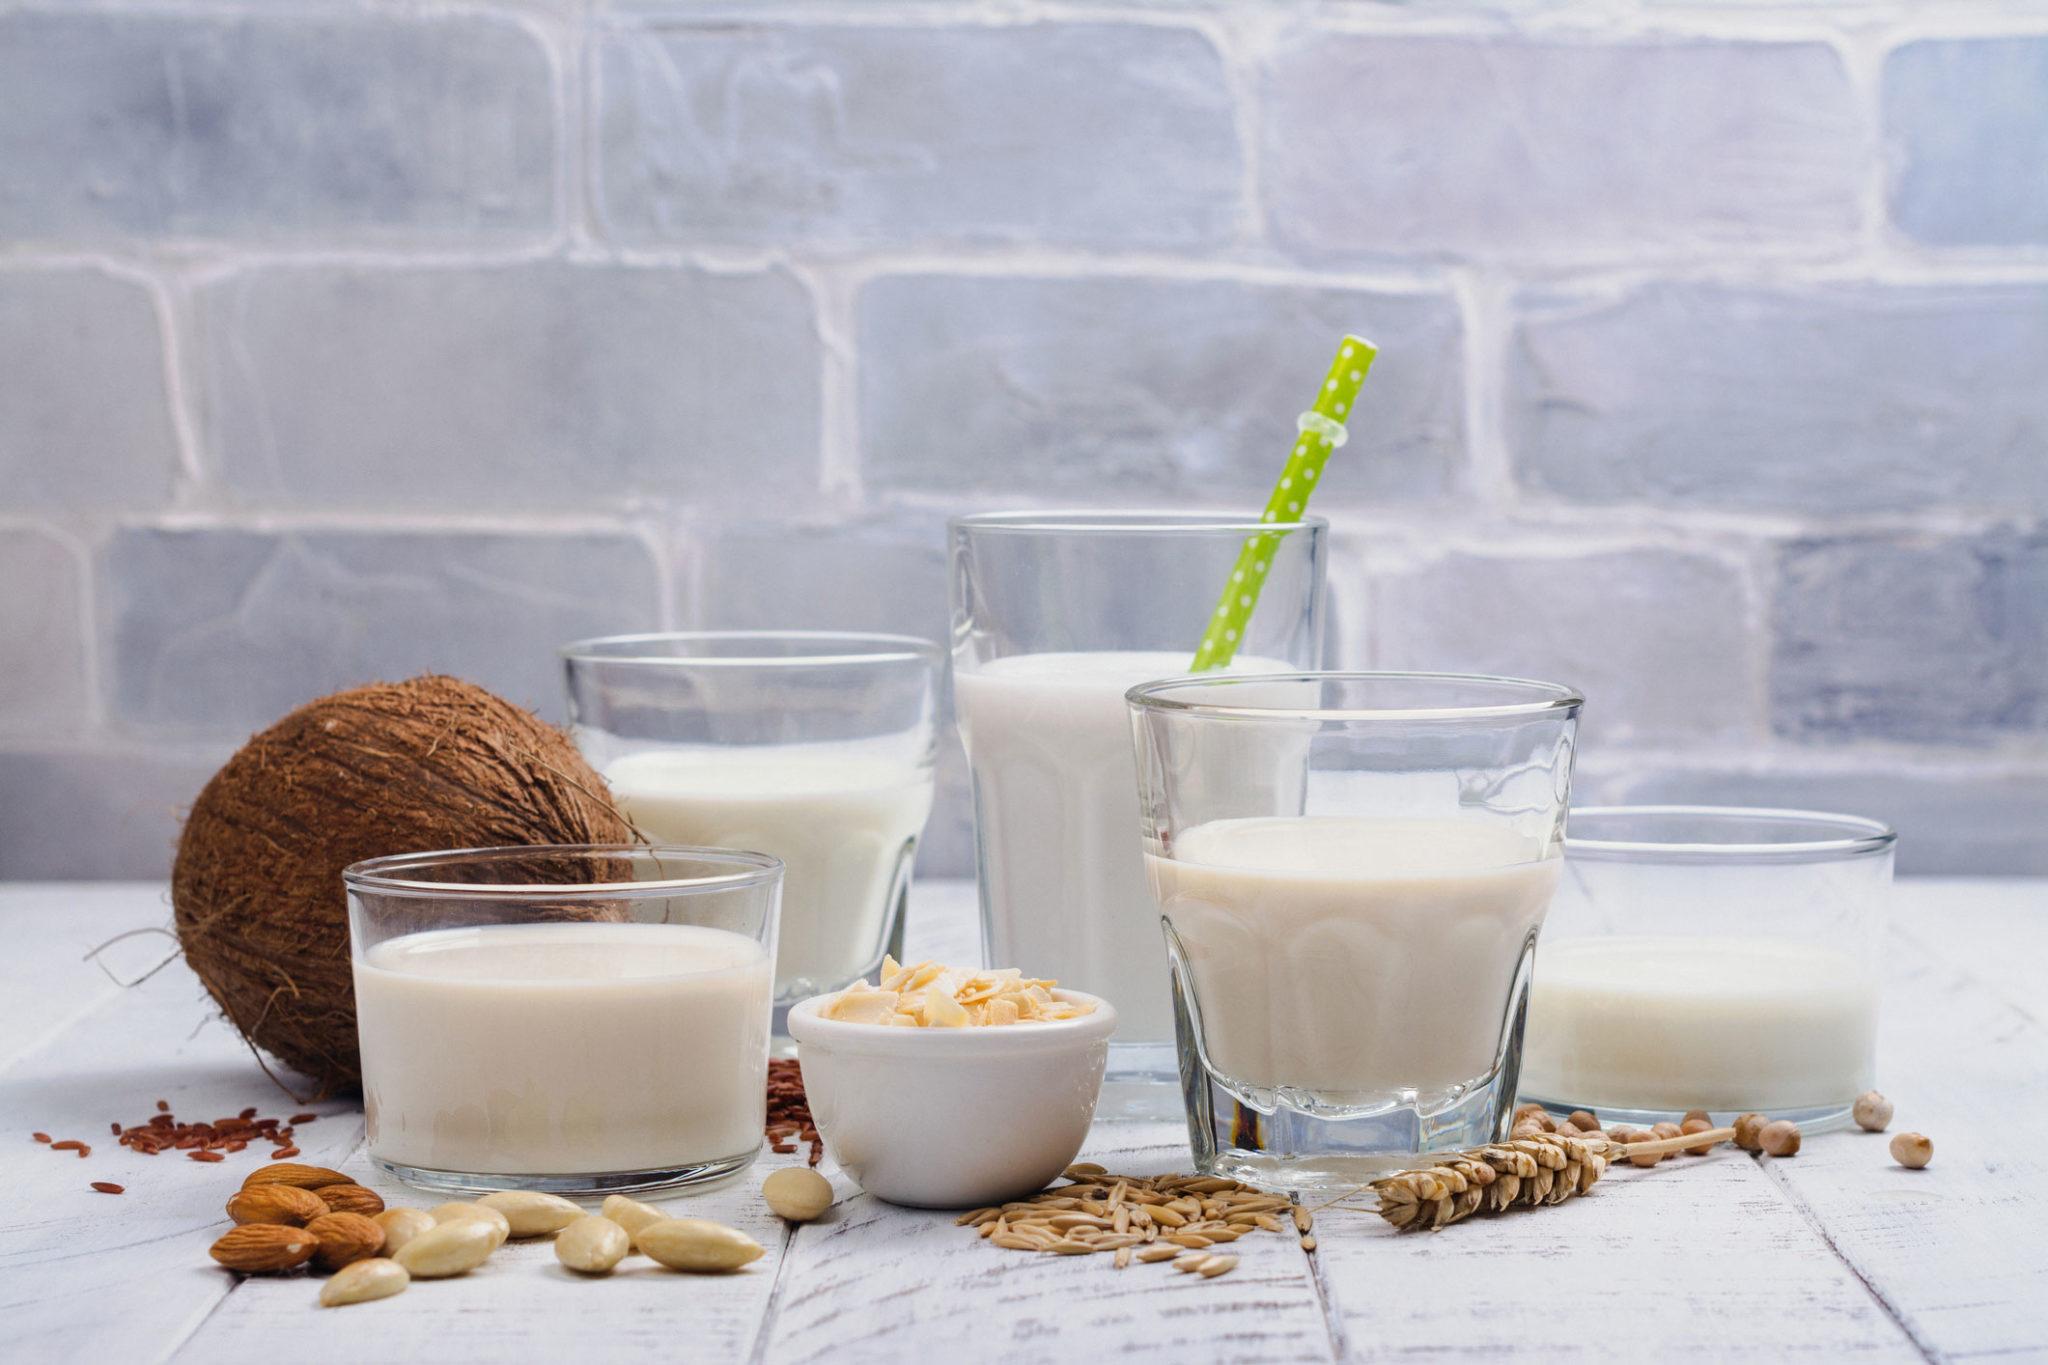 Different types of milks